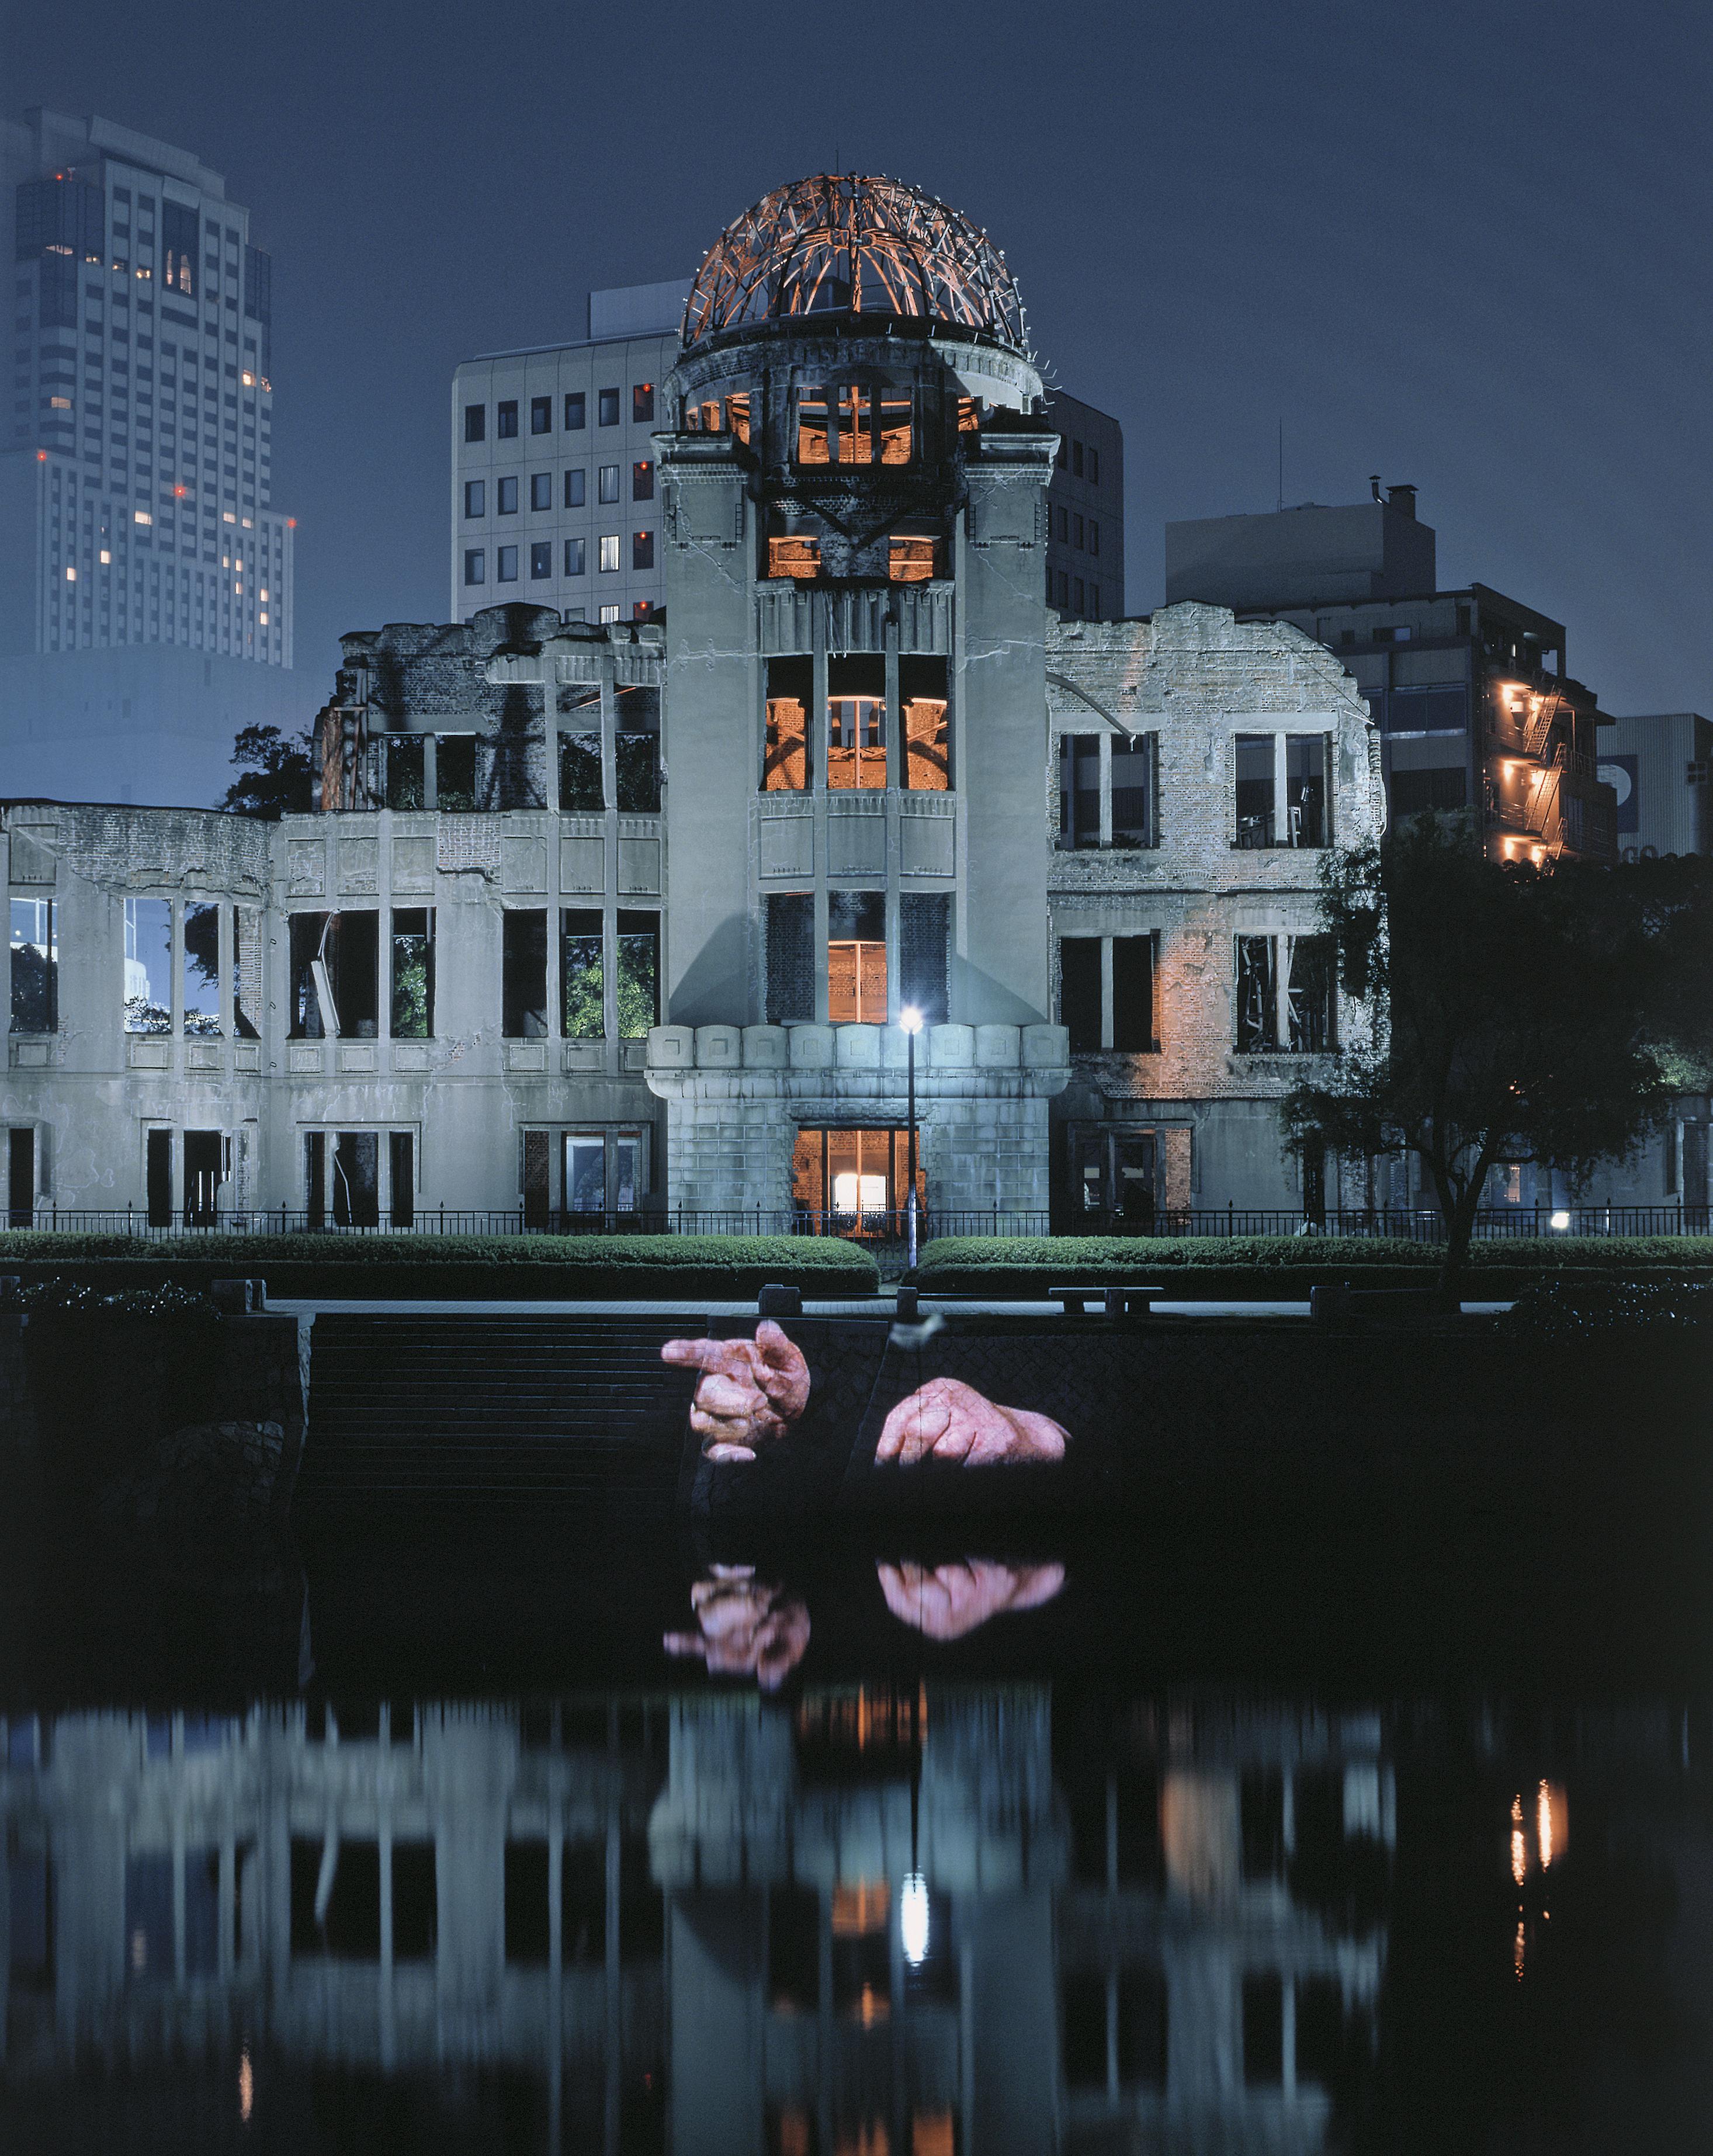 Projekcja wHiroszimie, Kopuła Bomby Atomowej, Hiroszima, 1999